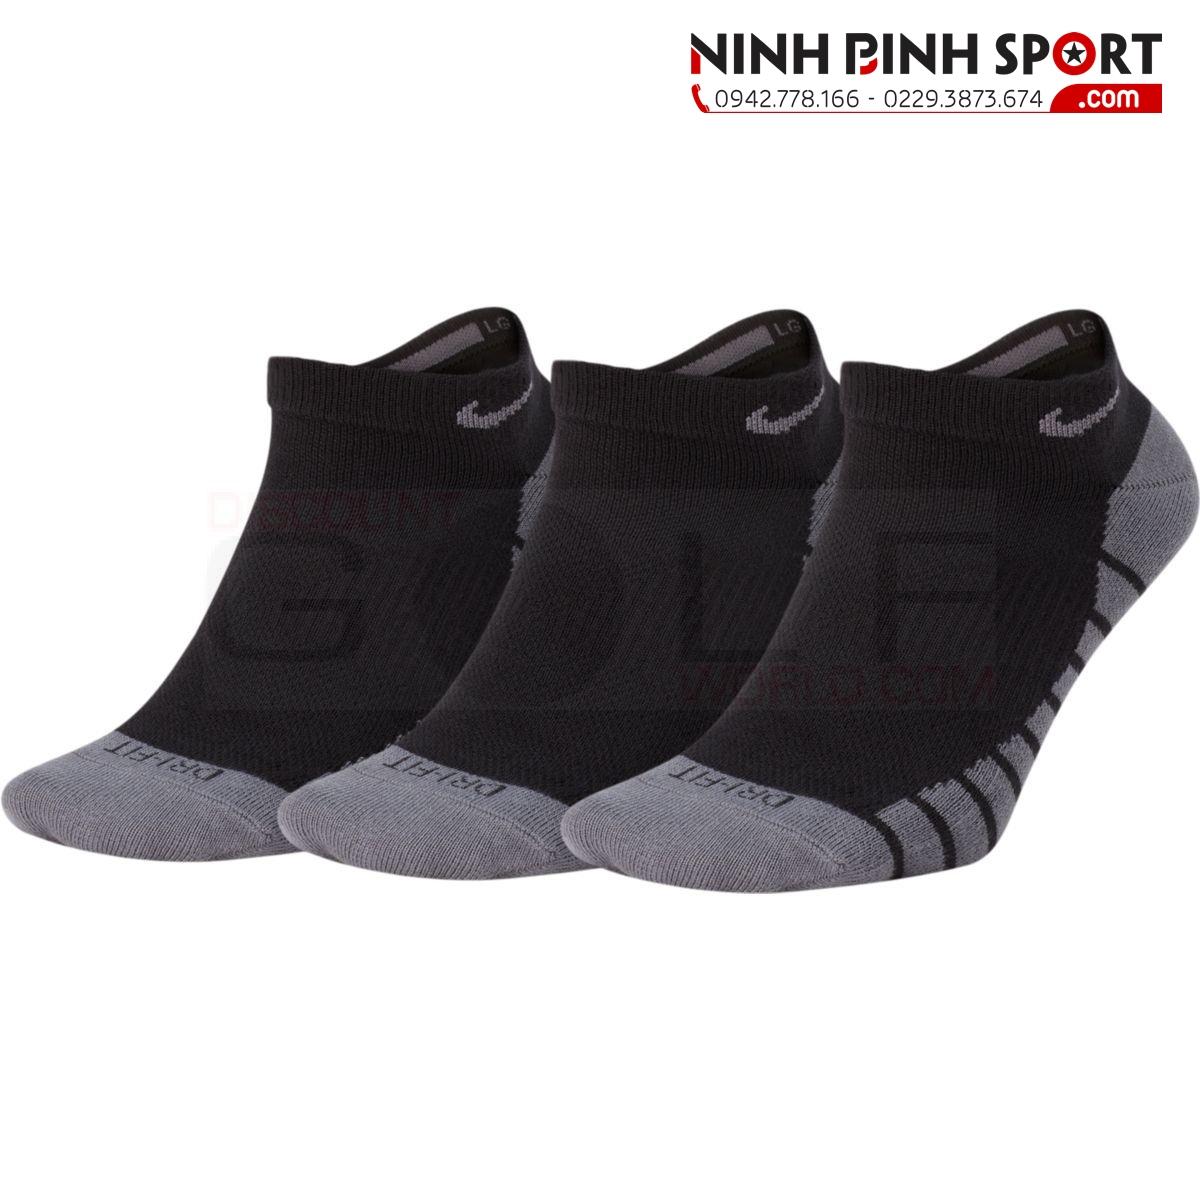 Tất Nike Lightweight No Show Golf Socks 3-Pair SG0781-010